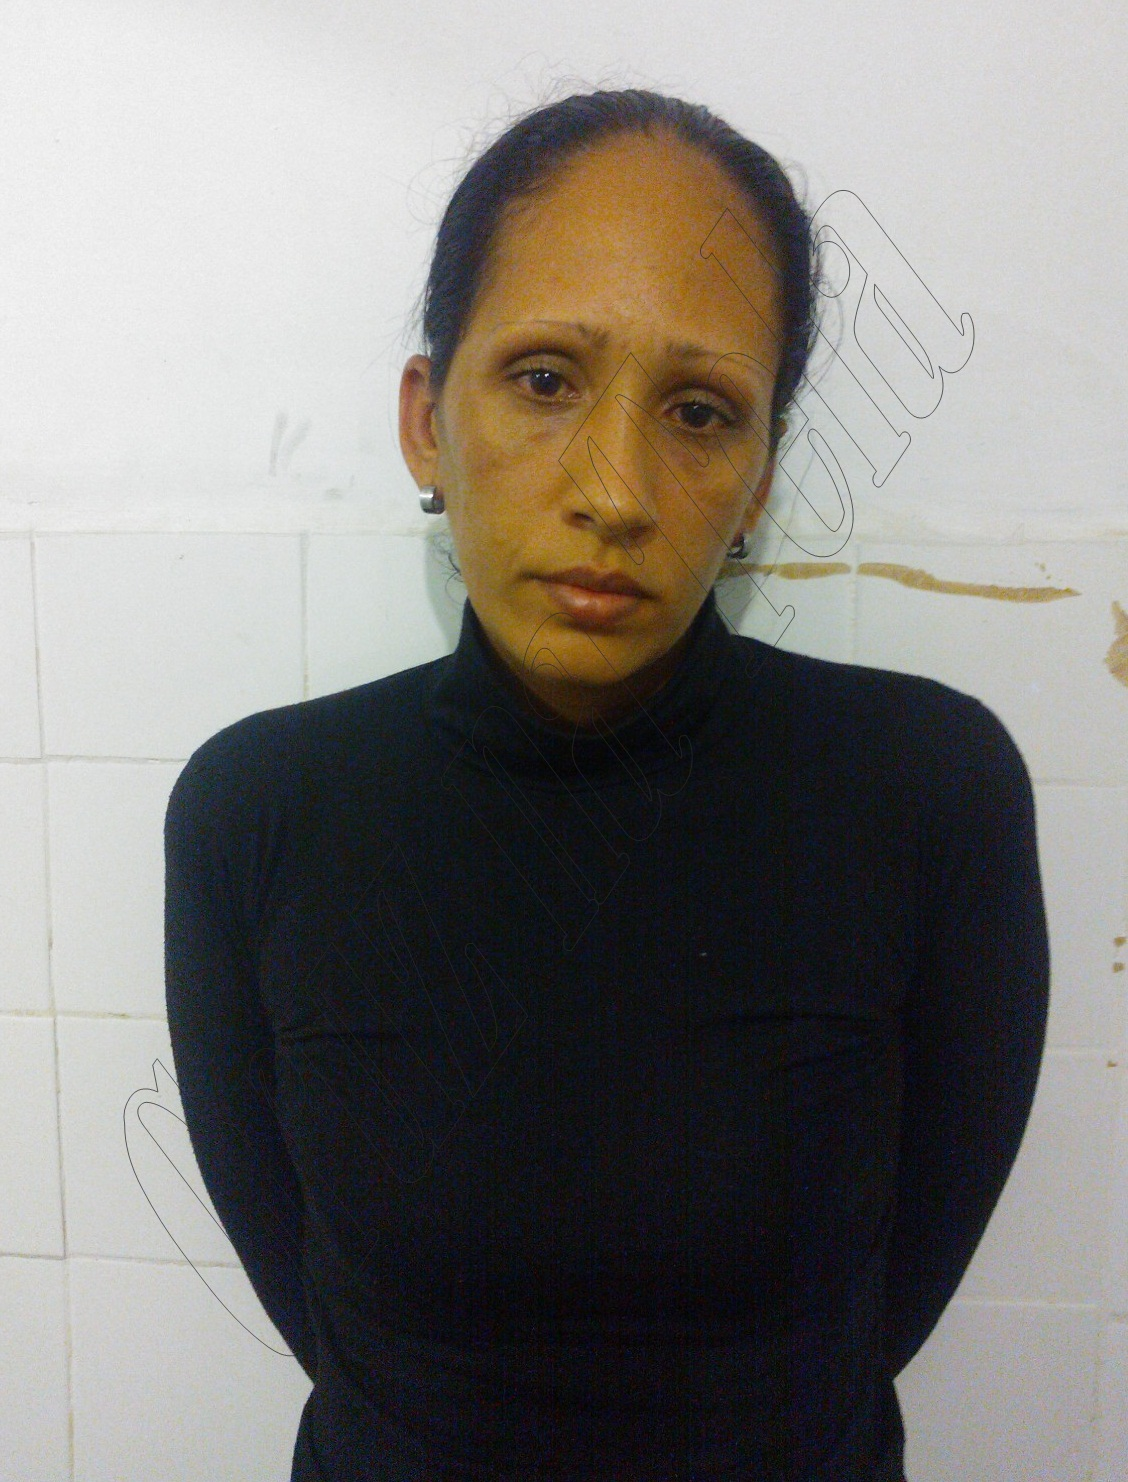 Cruz Na Tela - Ueviton Santana: Cruz Das Almas Bahia:Lorena Caiu Na